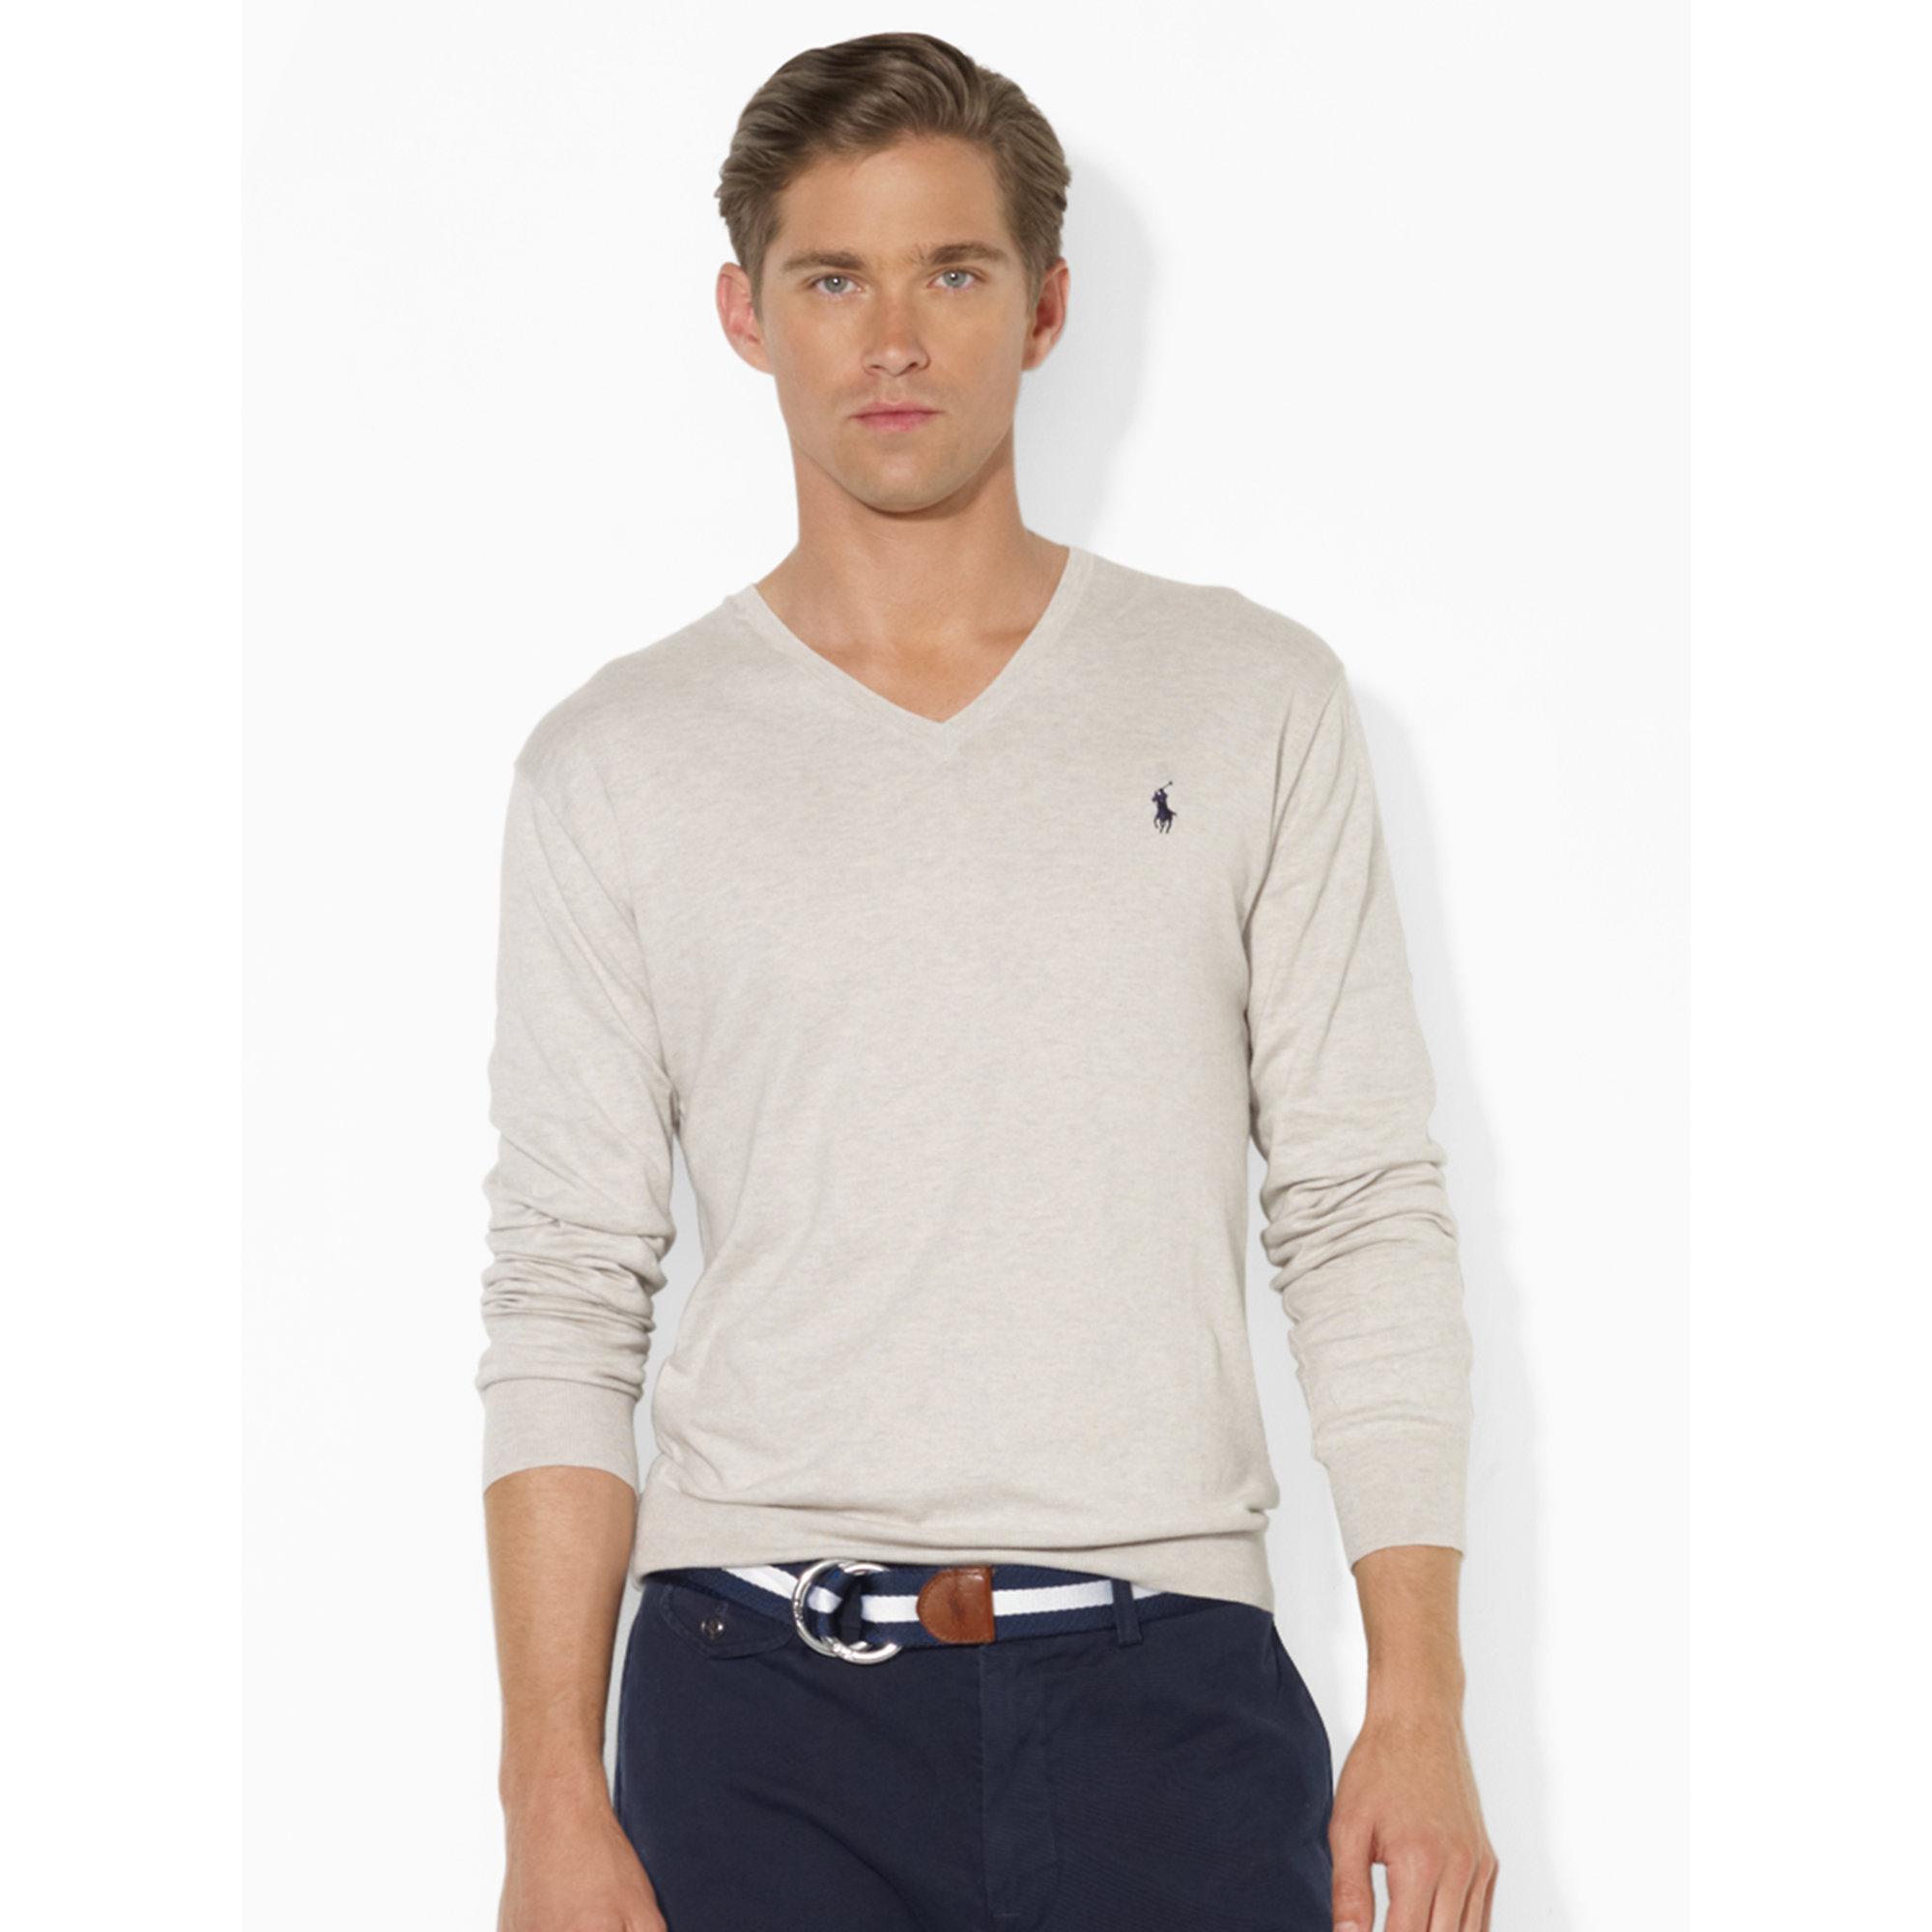 aa09d1d0 Polo Ralph Lauren Pima Cotton V-neck Sweater in Gray for Men - Lyst